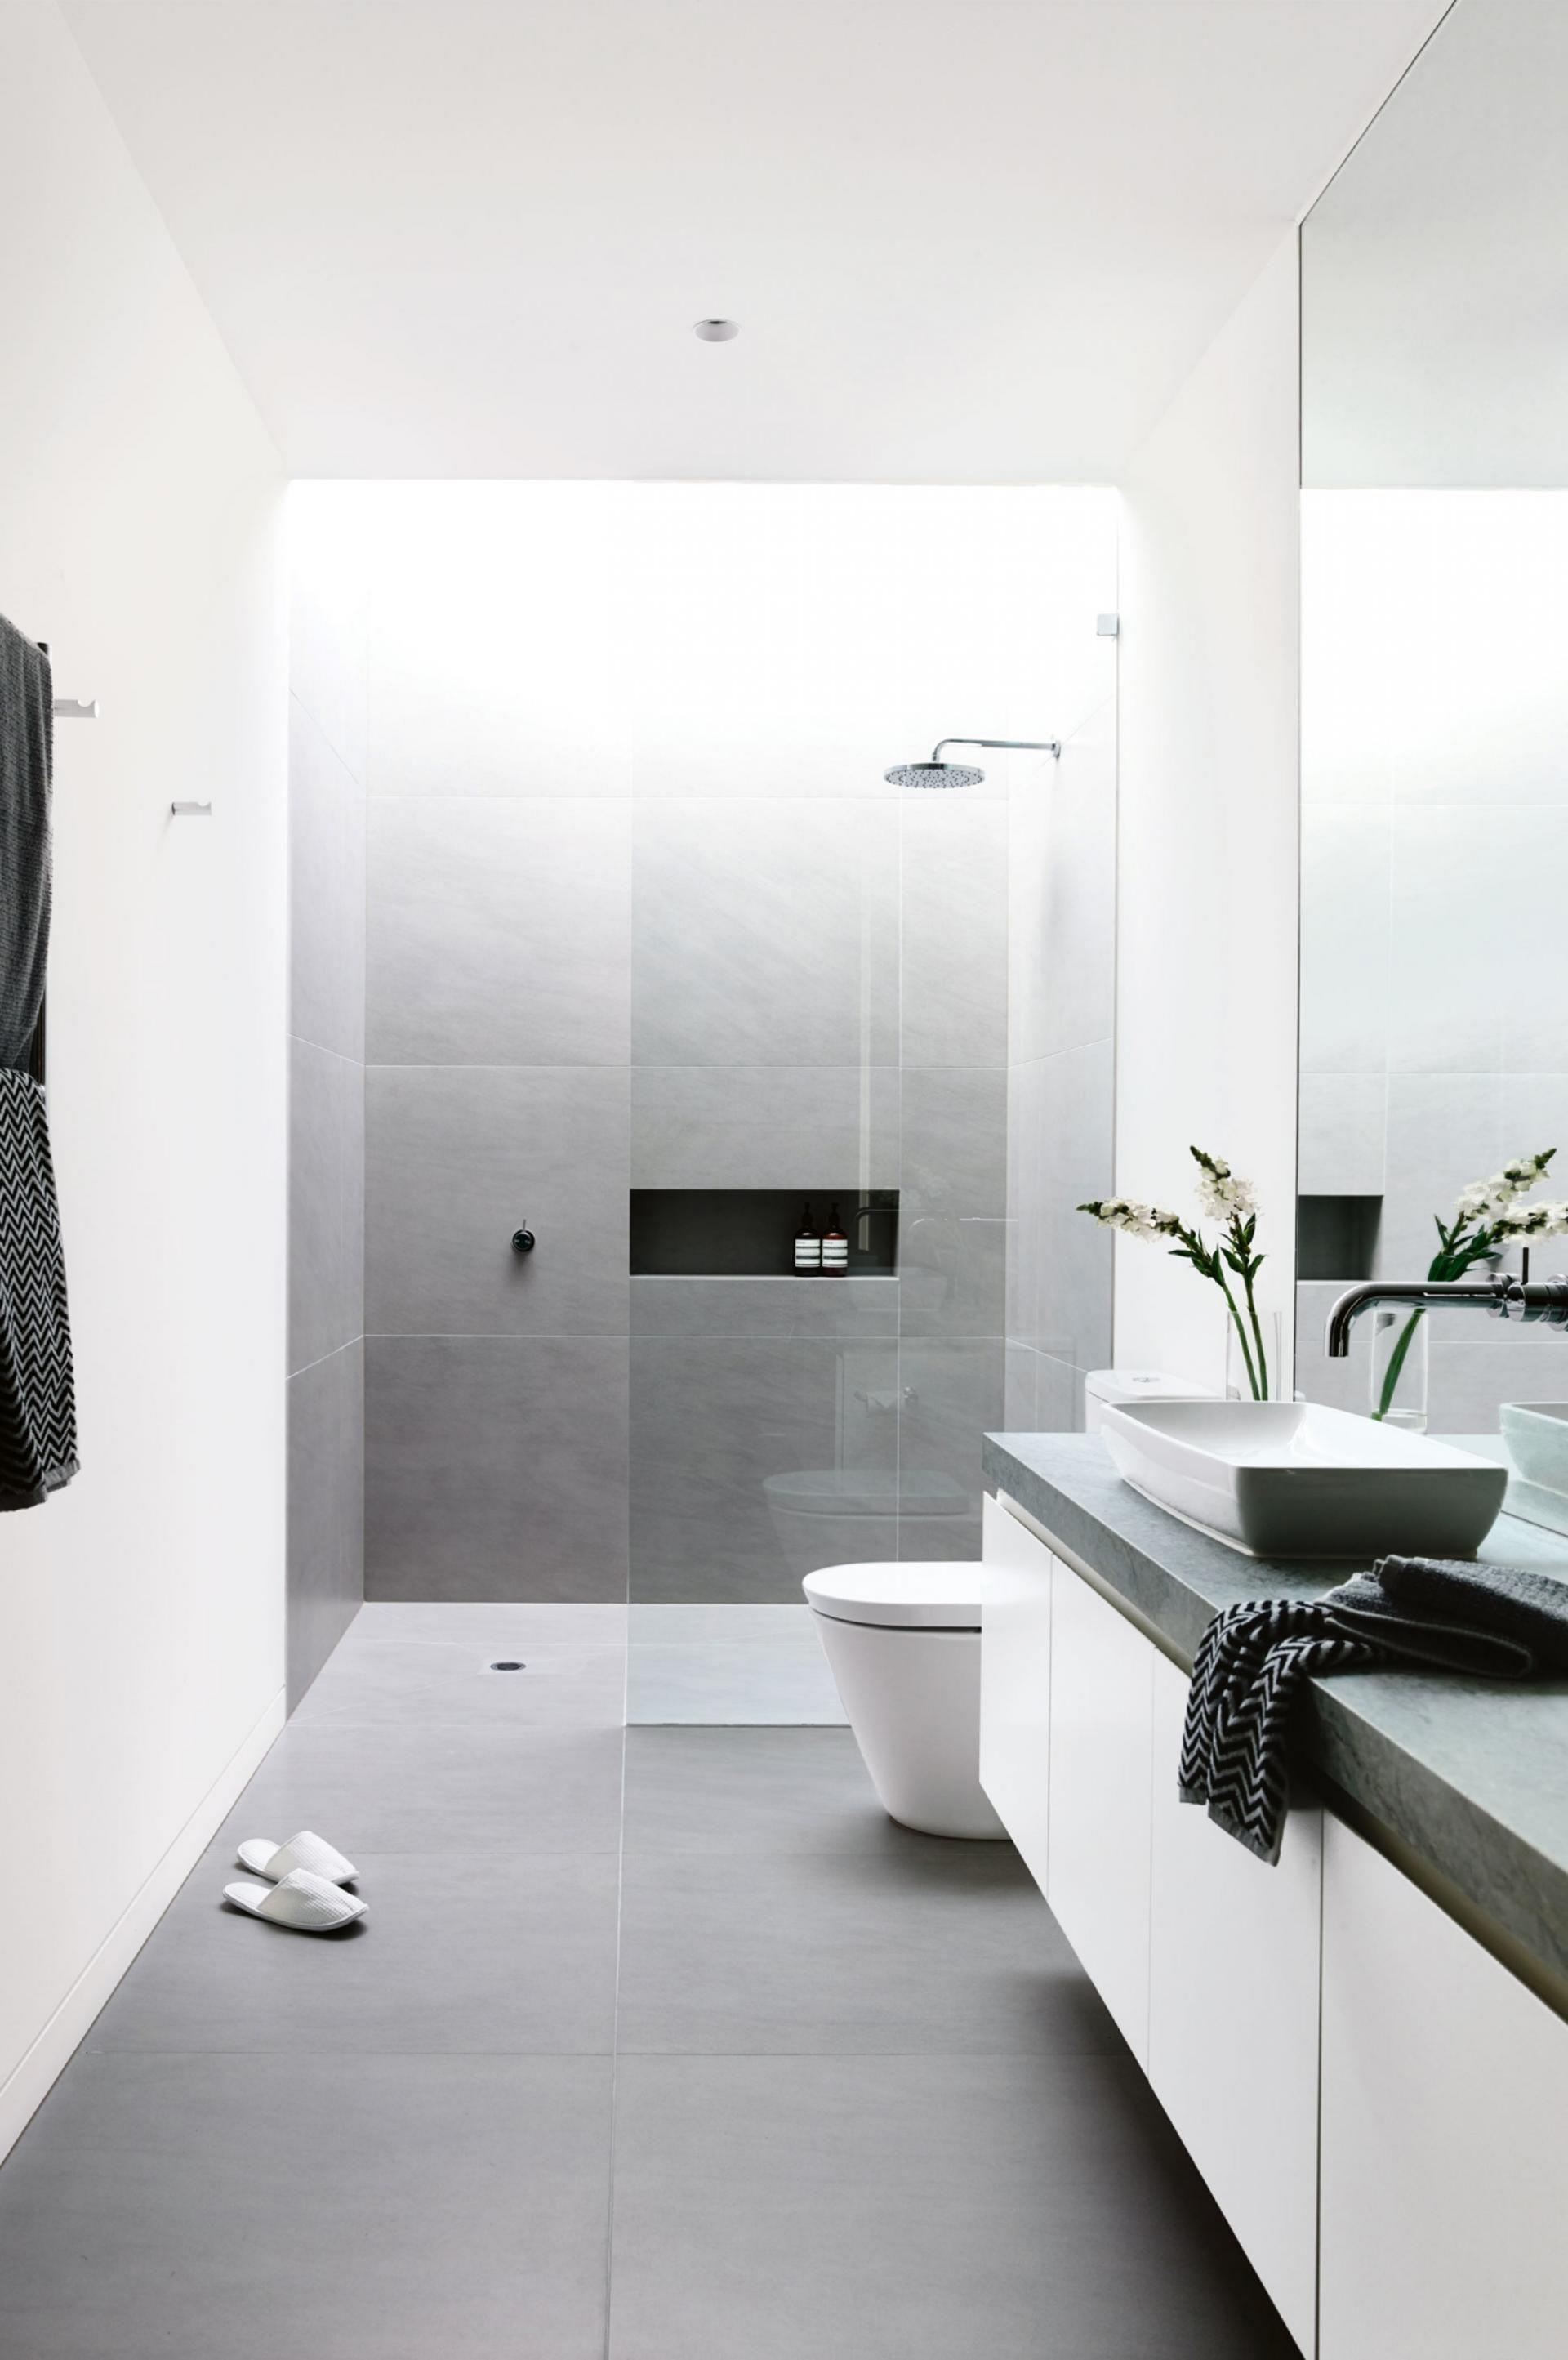 15 Incredible Gray And White Bathroom Ideas For Your New Bathrooms Inspiration Trendy Bathroom Tiles Modern Bathroom Bathroom Layout